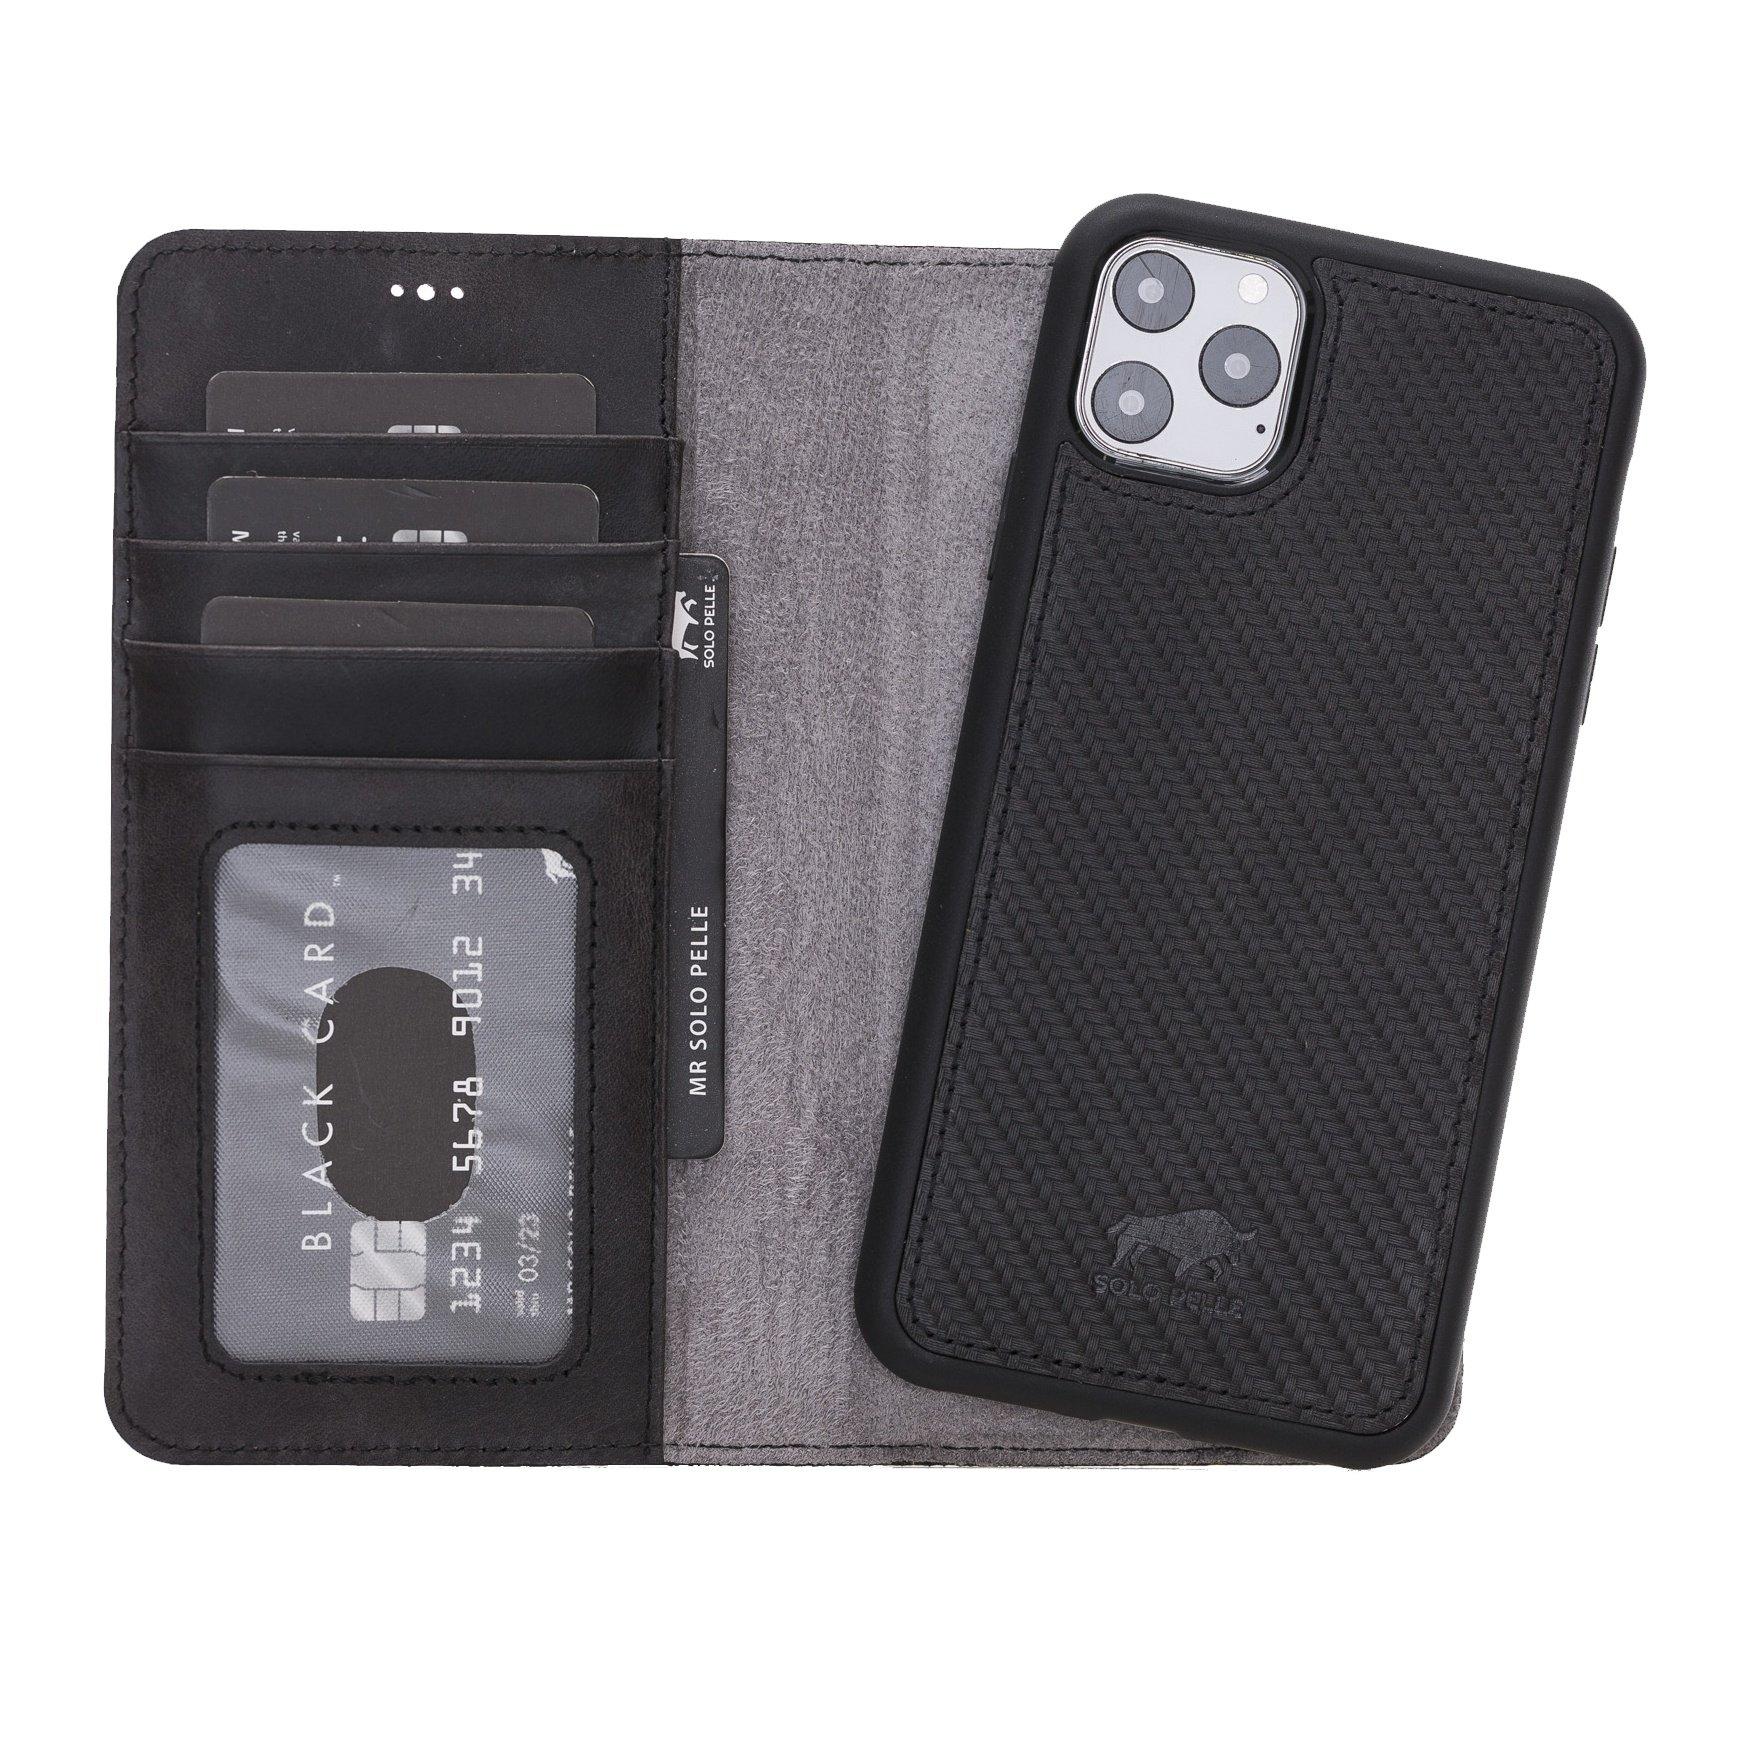 Solo Pelle Lederhülle kompatibel für iPhone 11 Pro Max 6.5 Zoll abnehmbare Hülle (2in1) (Carbonprägung Leder)